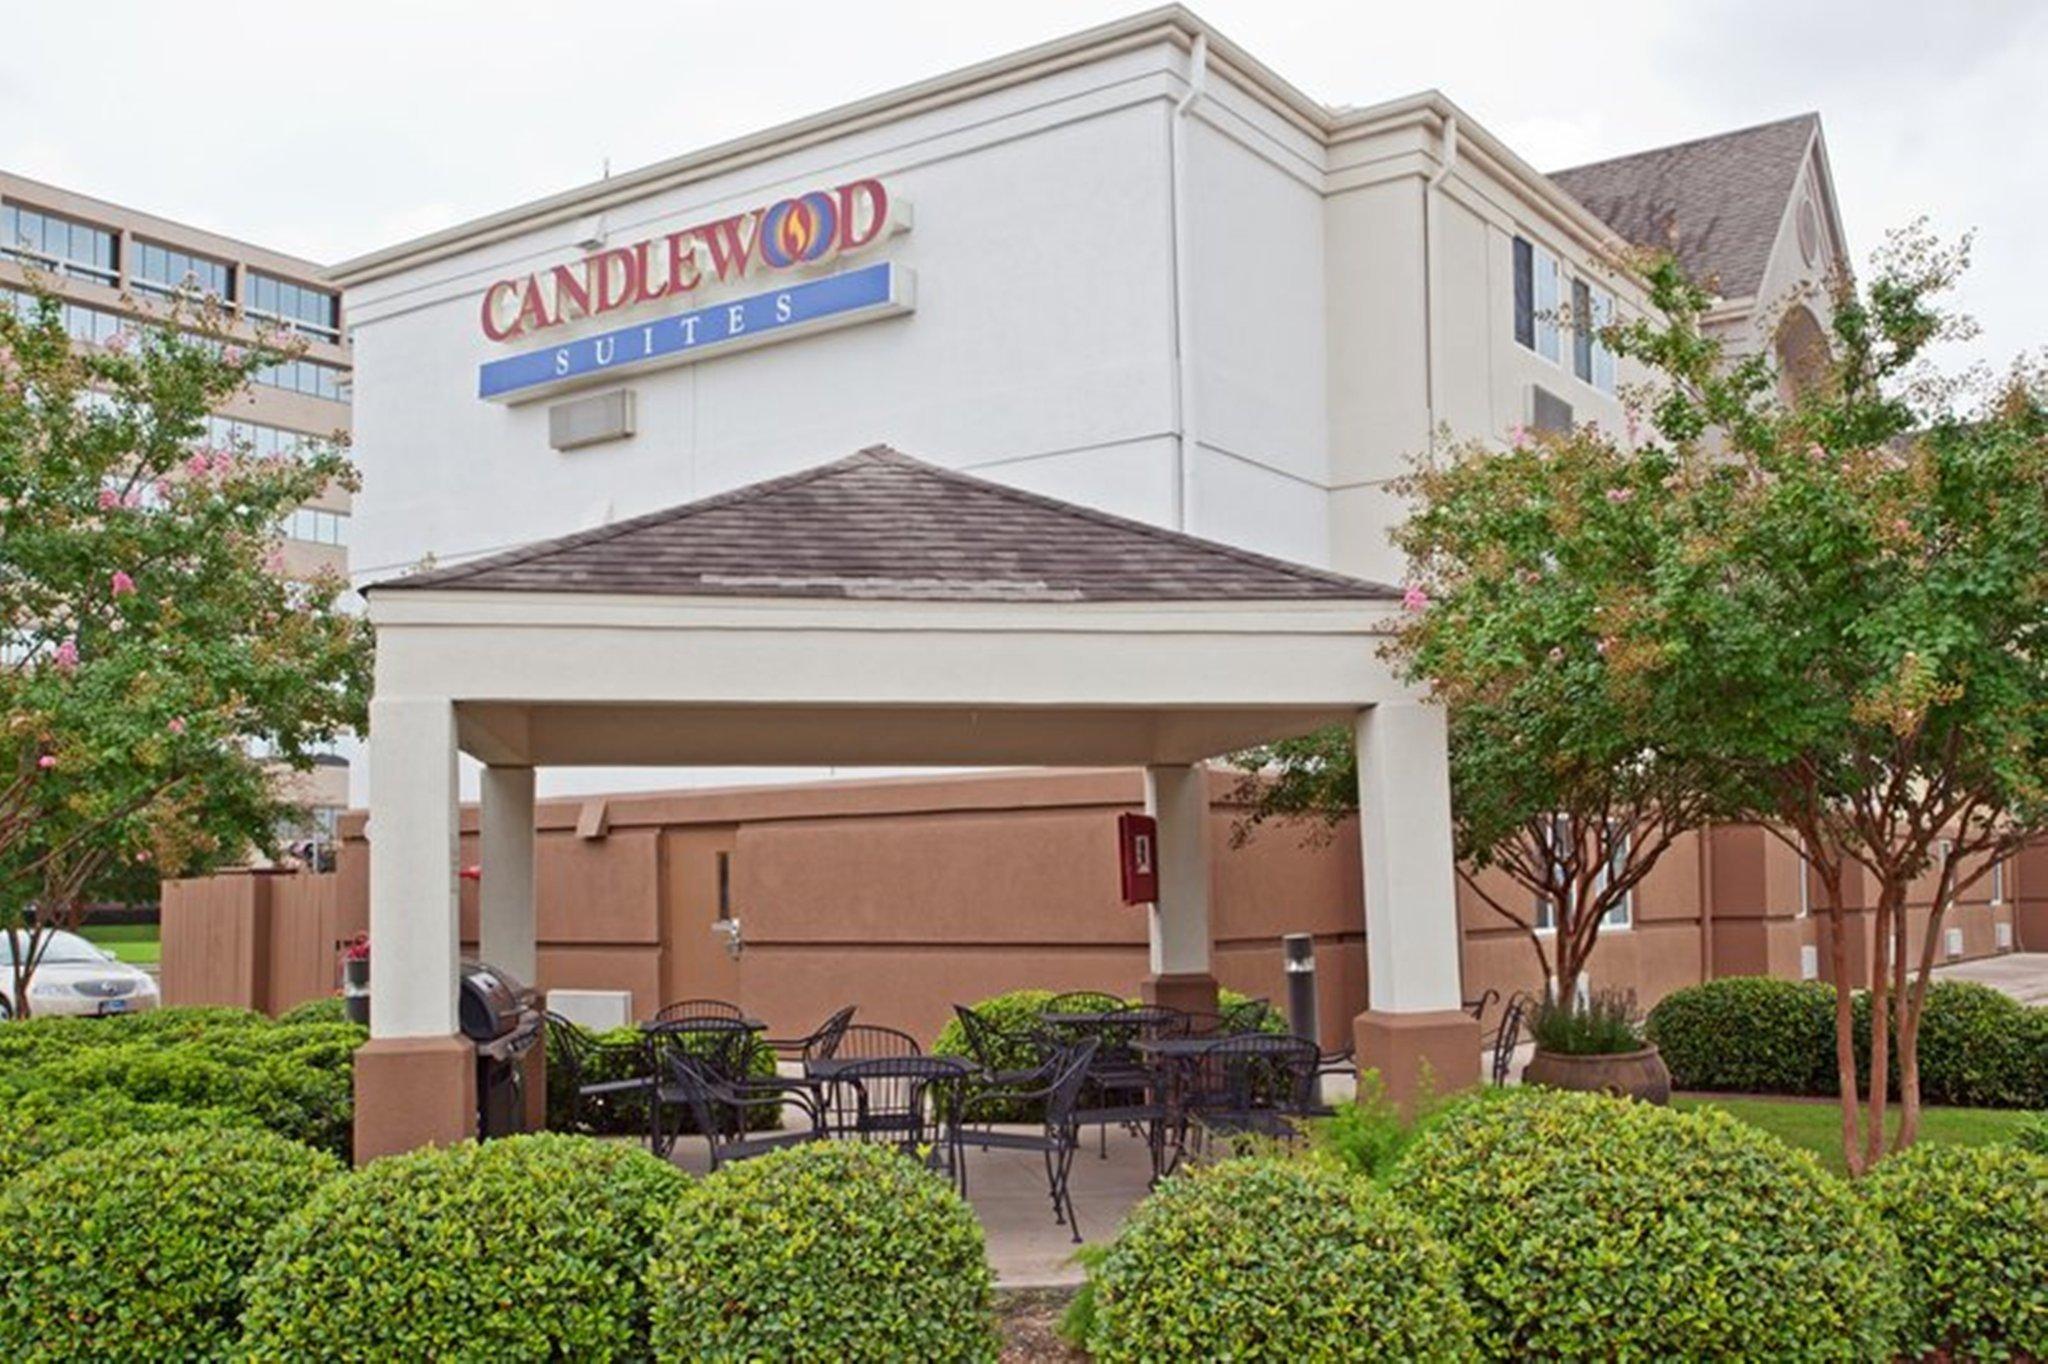 Candlewood Suites - Santa Clara